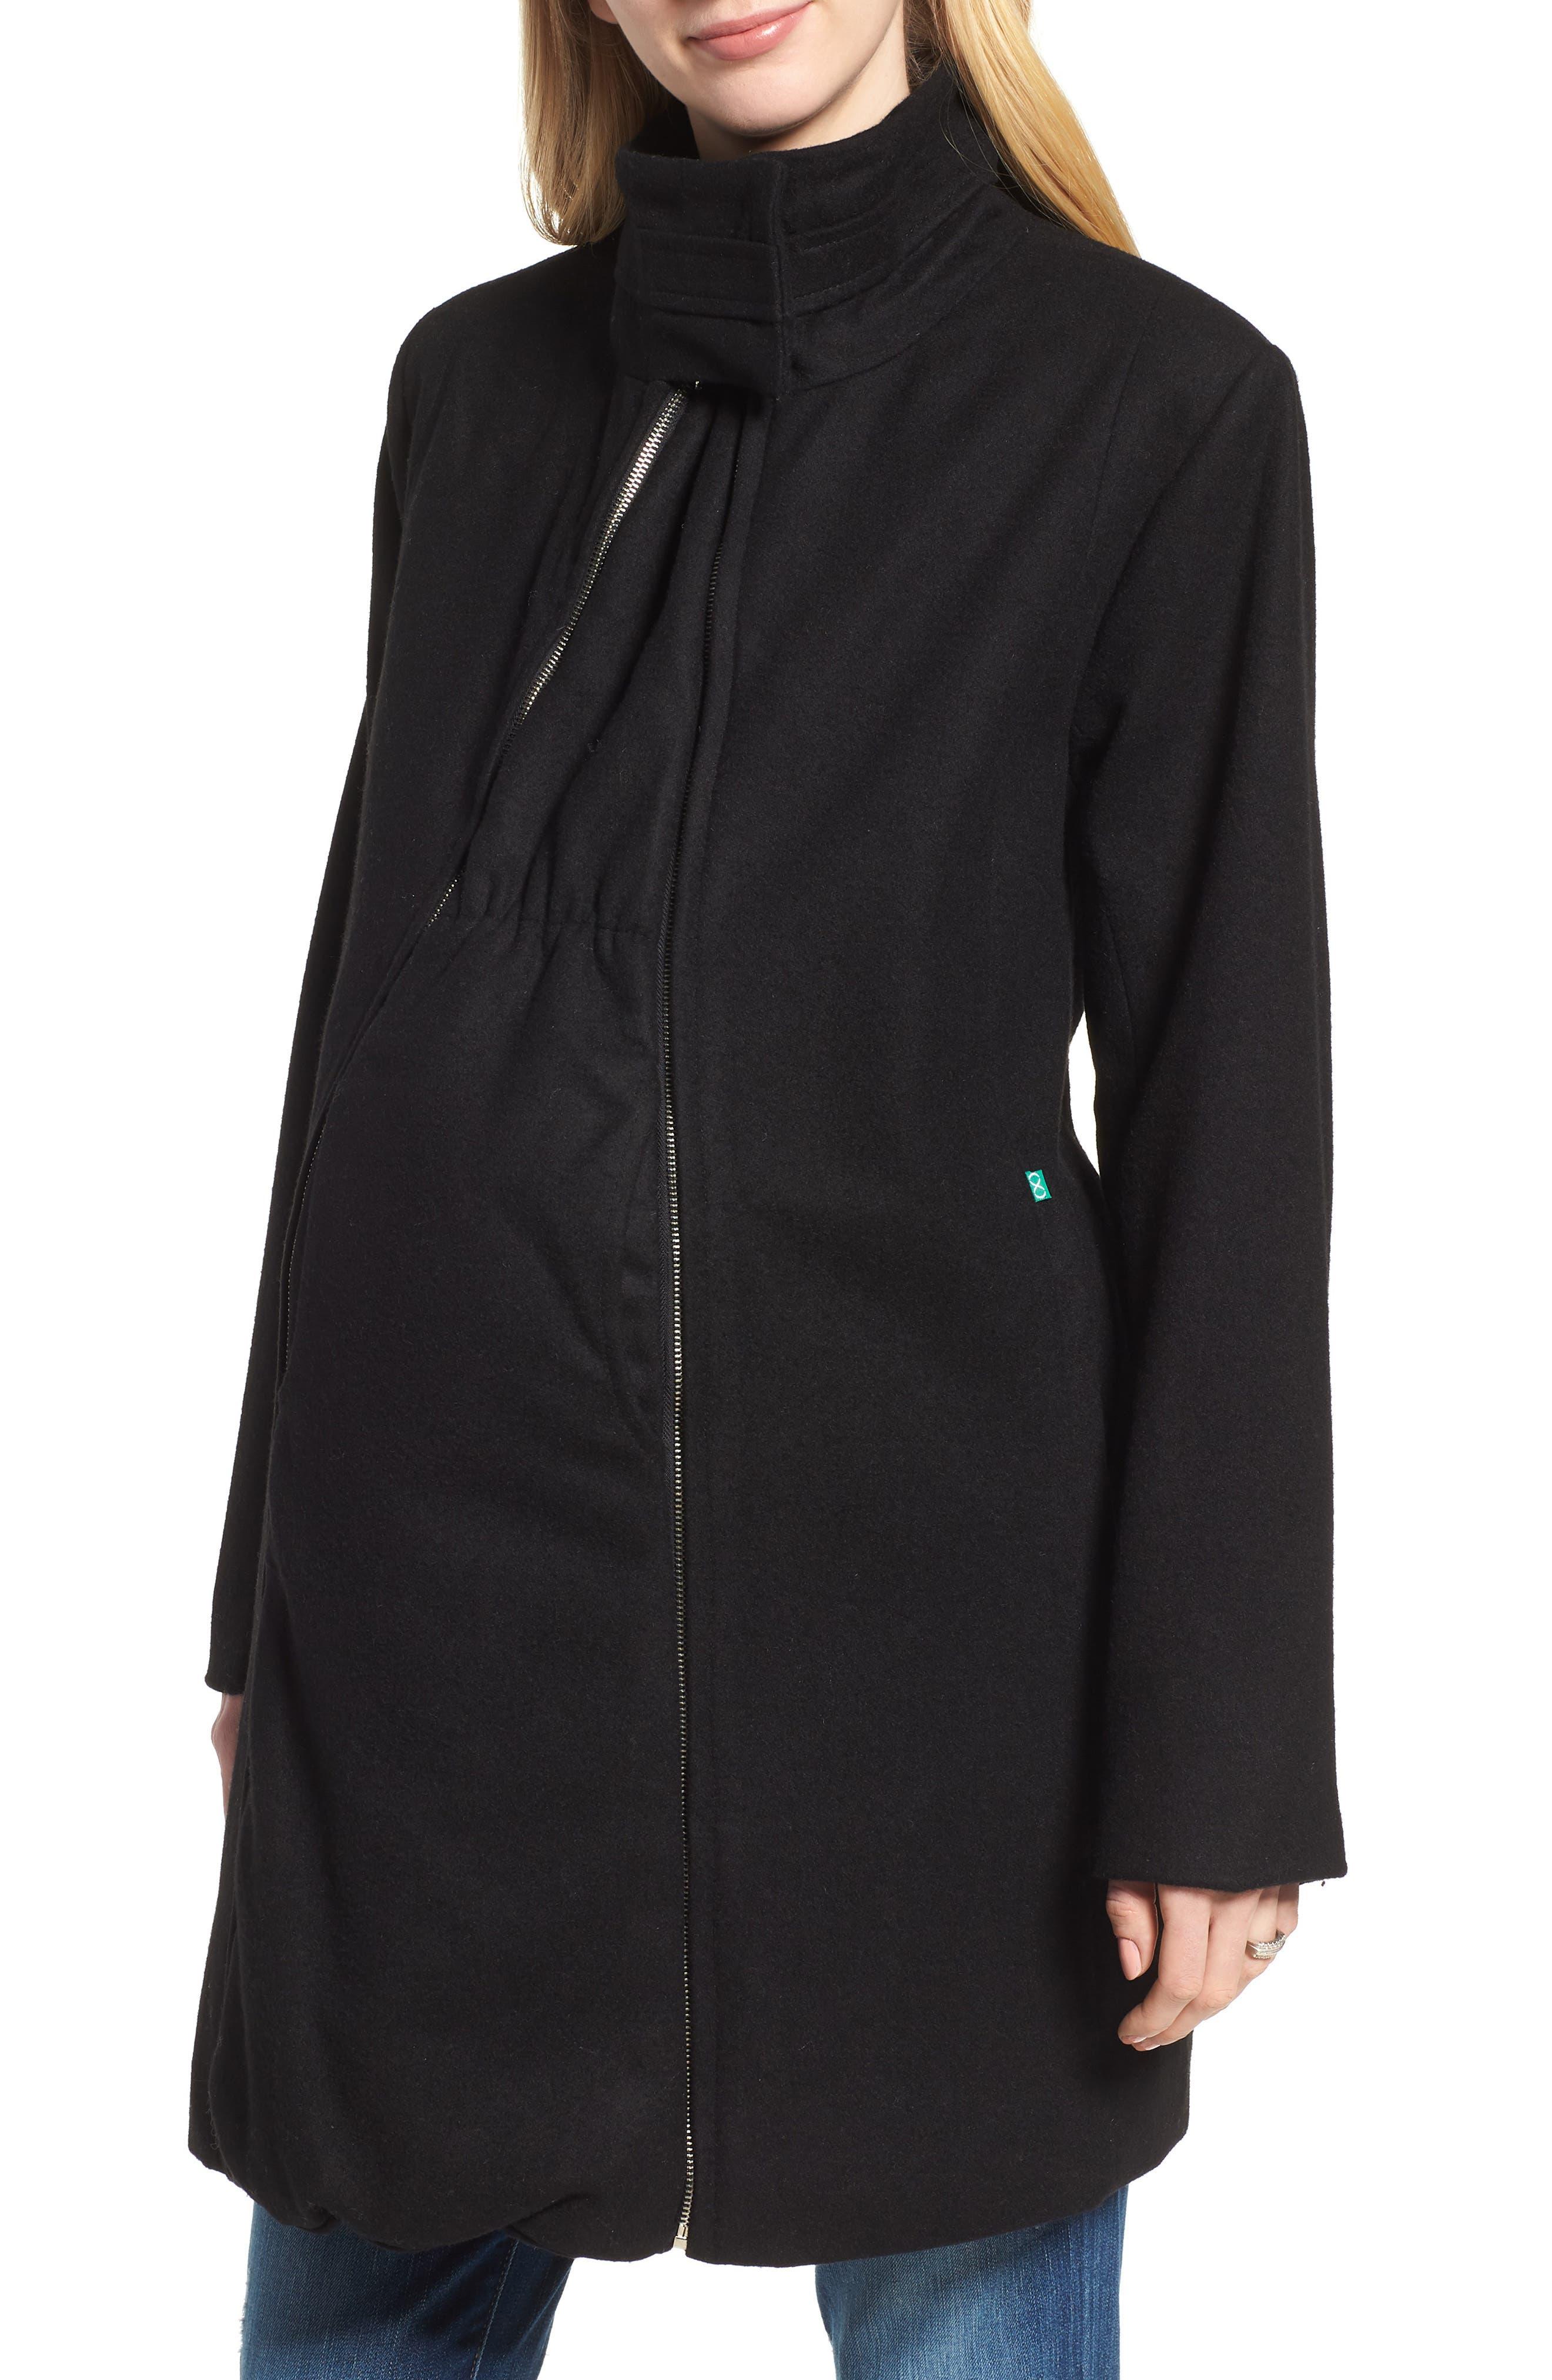 MODERN ETERNITY, Convertible 3-in-1 Maternity/Nursing Coat, Main thumbnail 1, color, BLACK